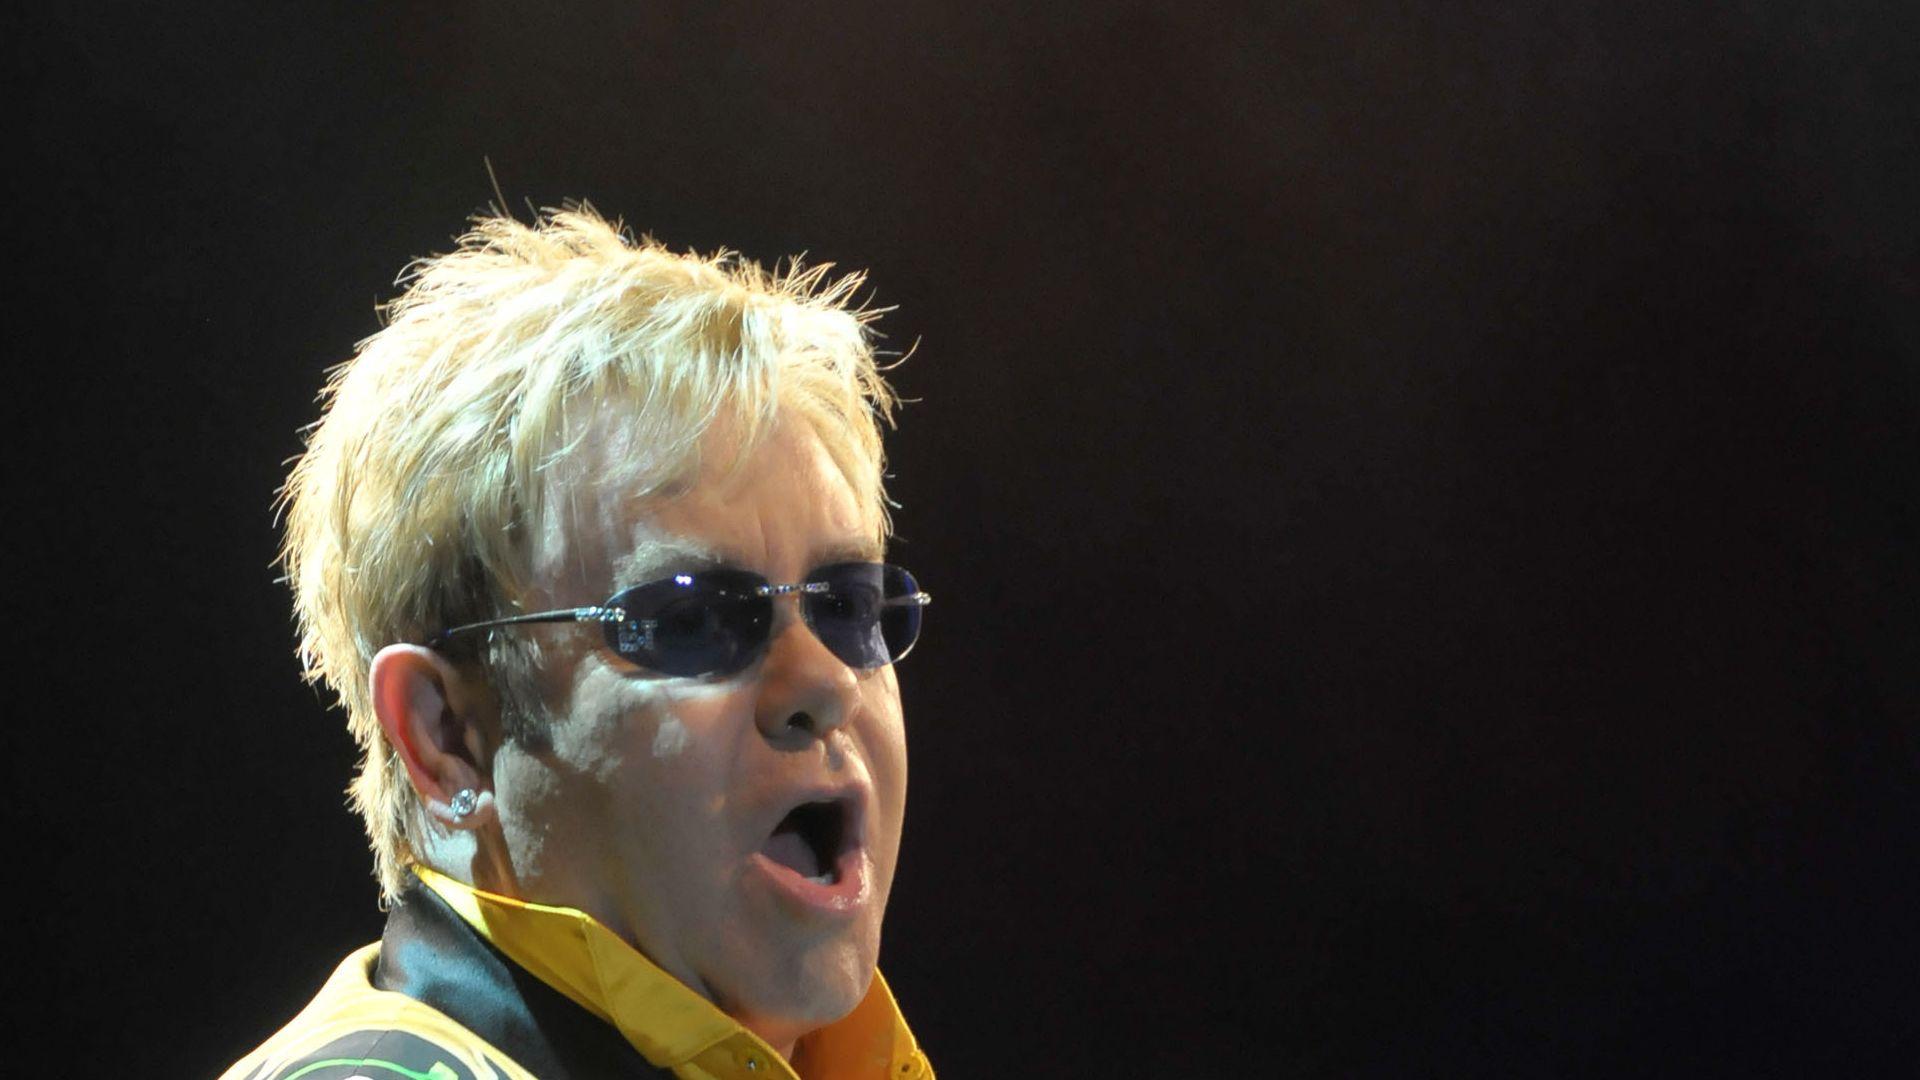 1920x1080 Music Elton John